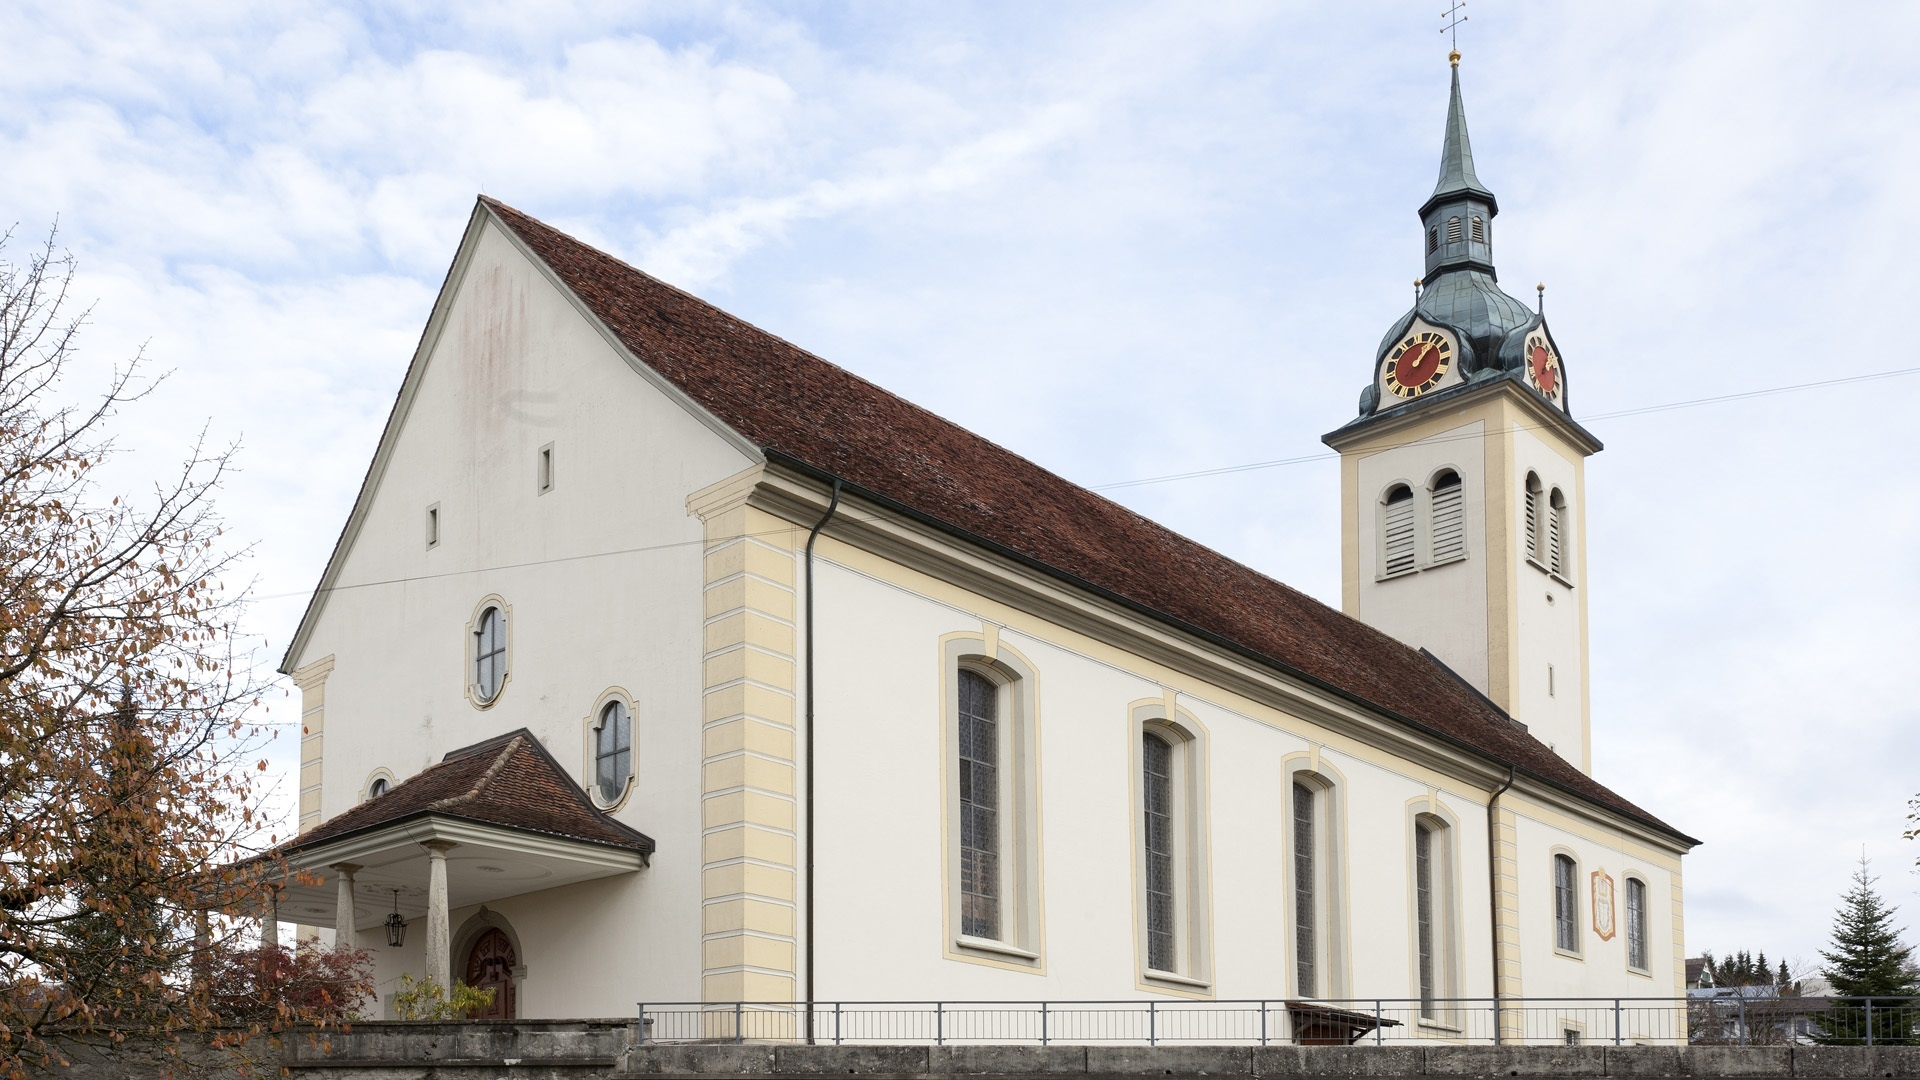 Sarmenstorf, Heilig Kreuz | © Roger Wehrli